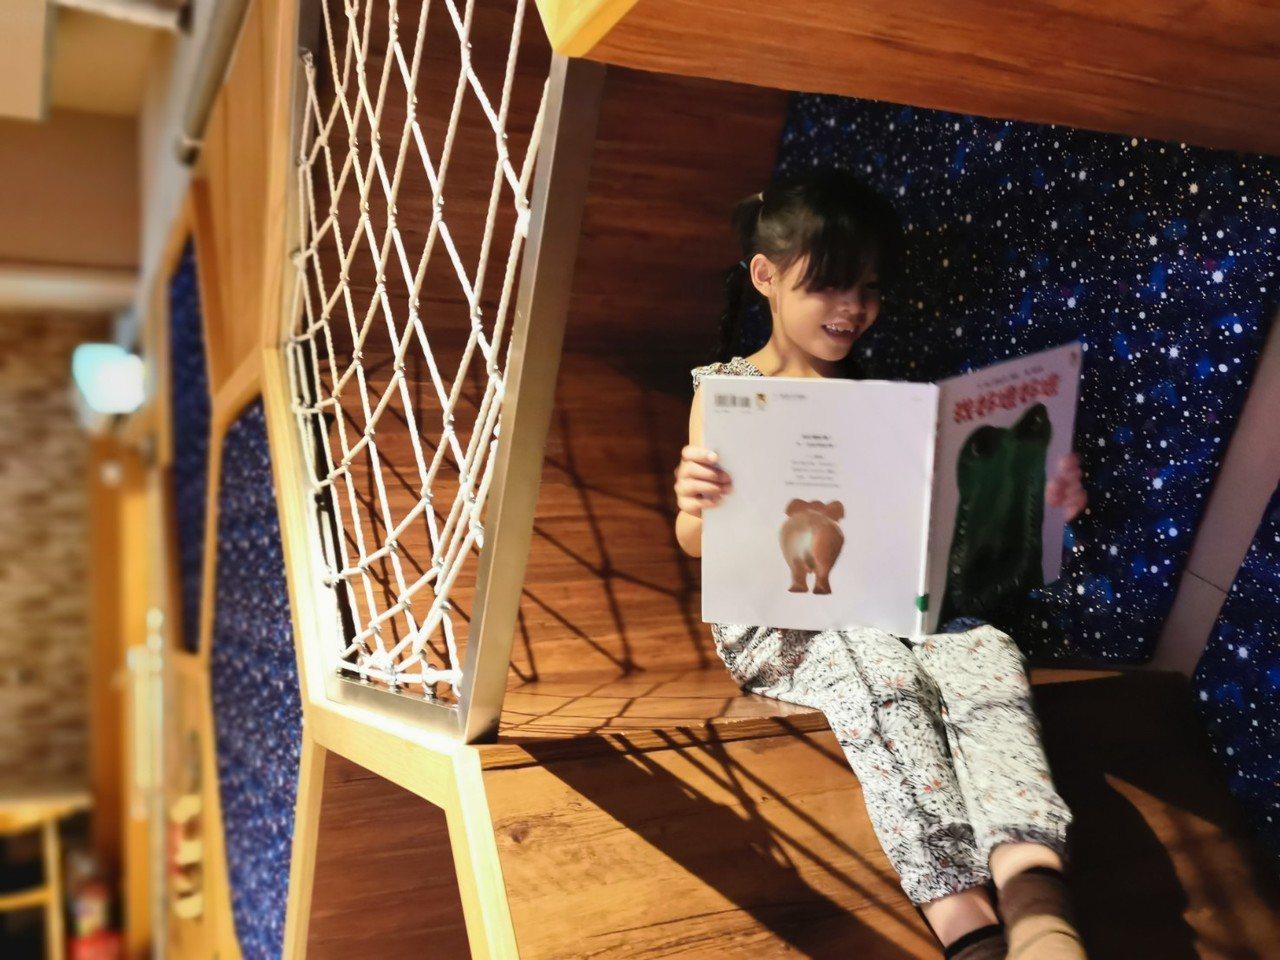 MONEYJUMP的蜂巢洞穴,小朋友躲在洞穴內看童話書,彷彿置身在童話故事裡。記...